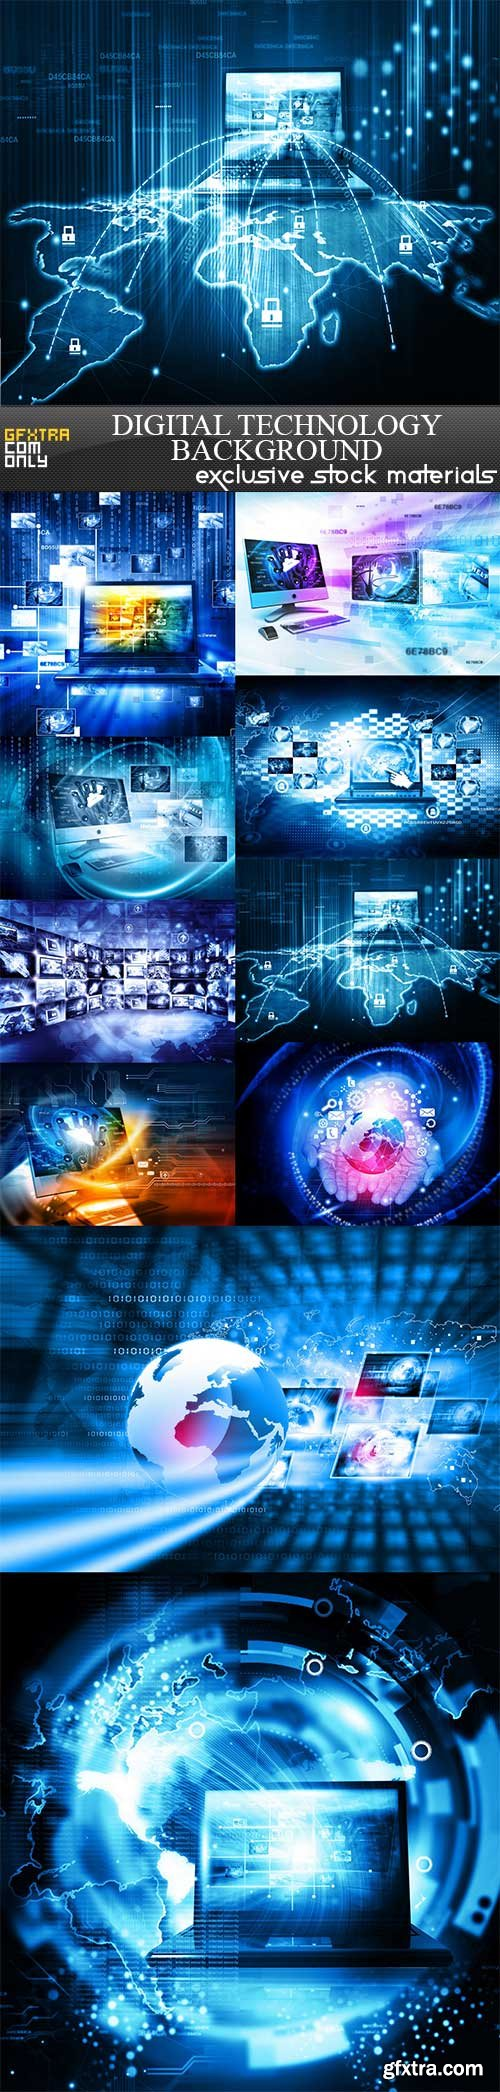 Digital technology background, 10 UHQ JPEG